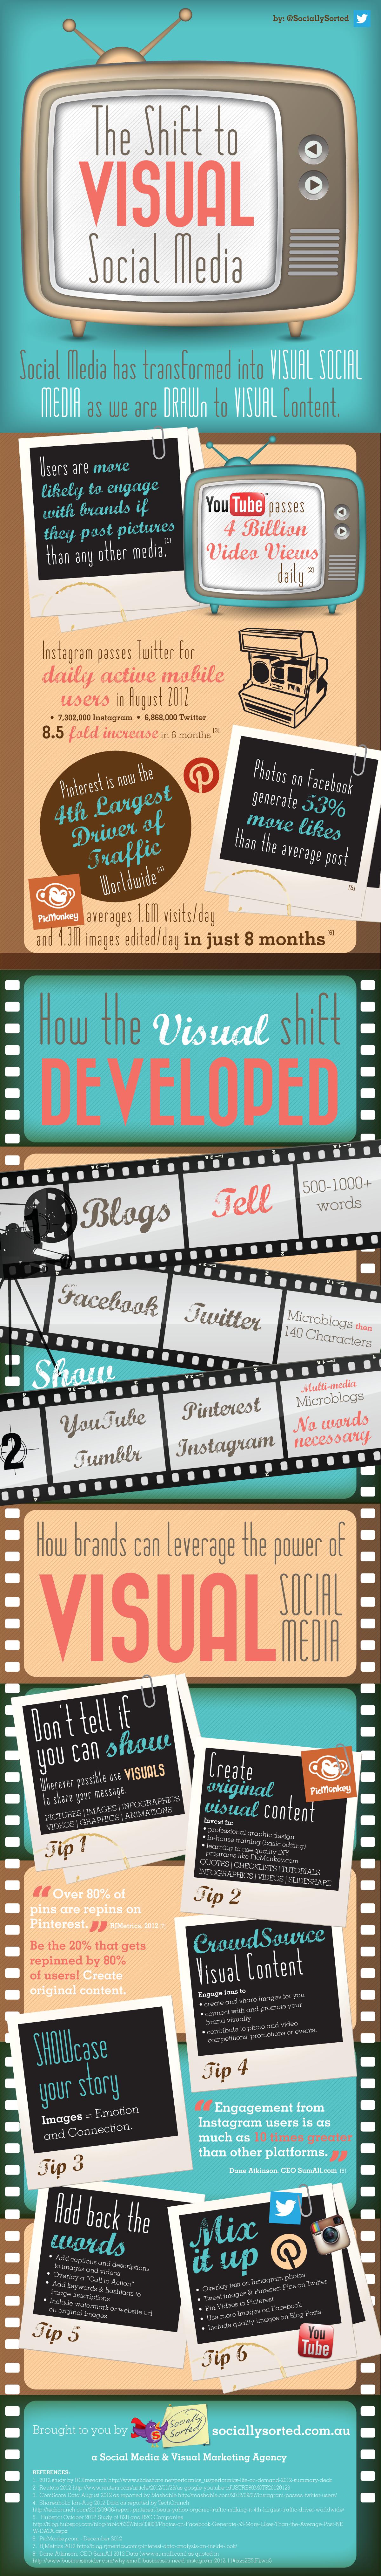 Shift to Visual Social Media